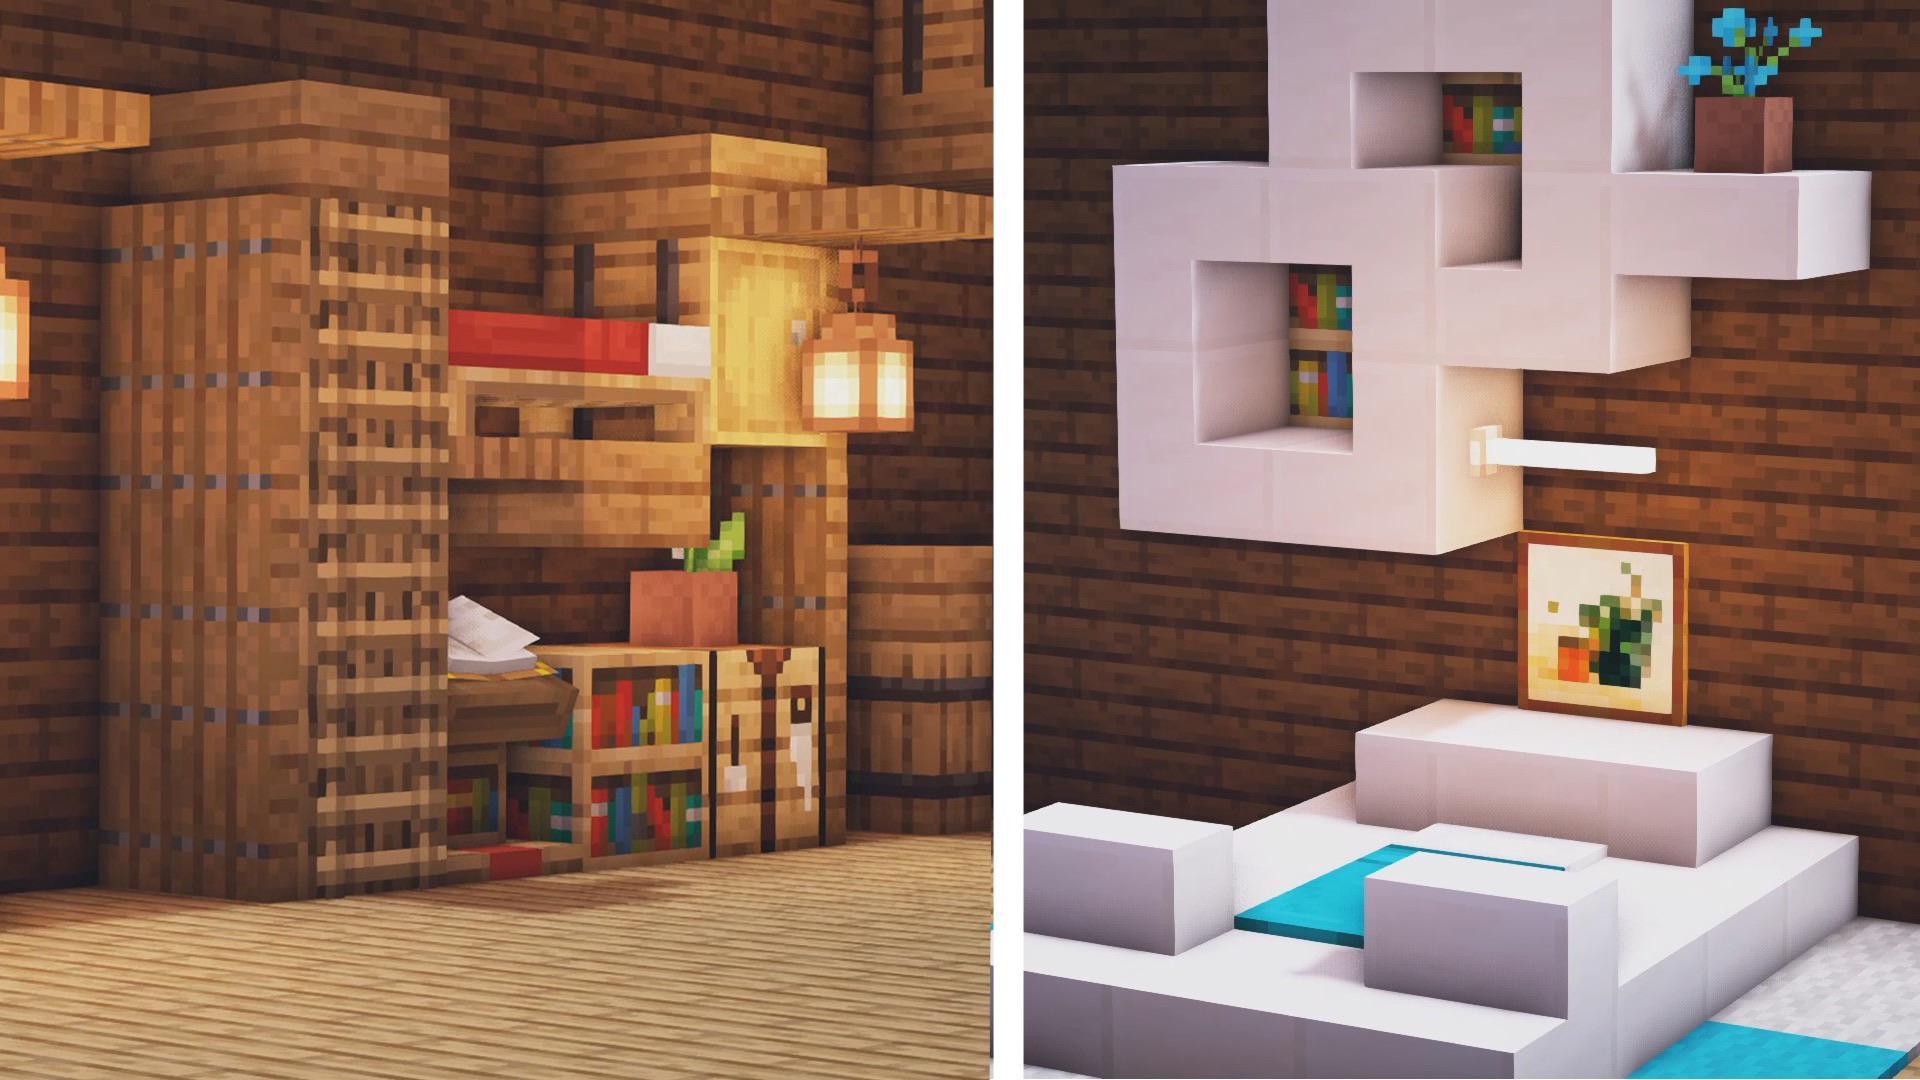 Cute Bunk Beds Minecraft Novocom Top